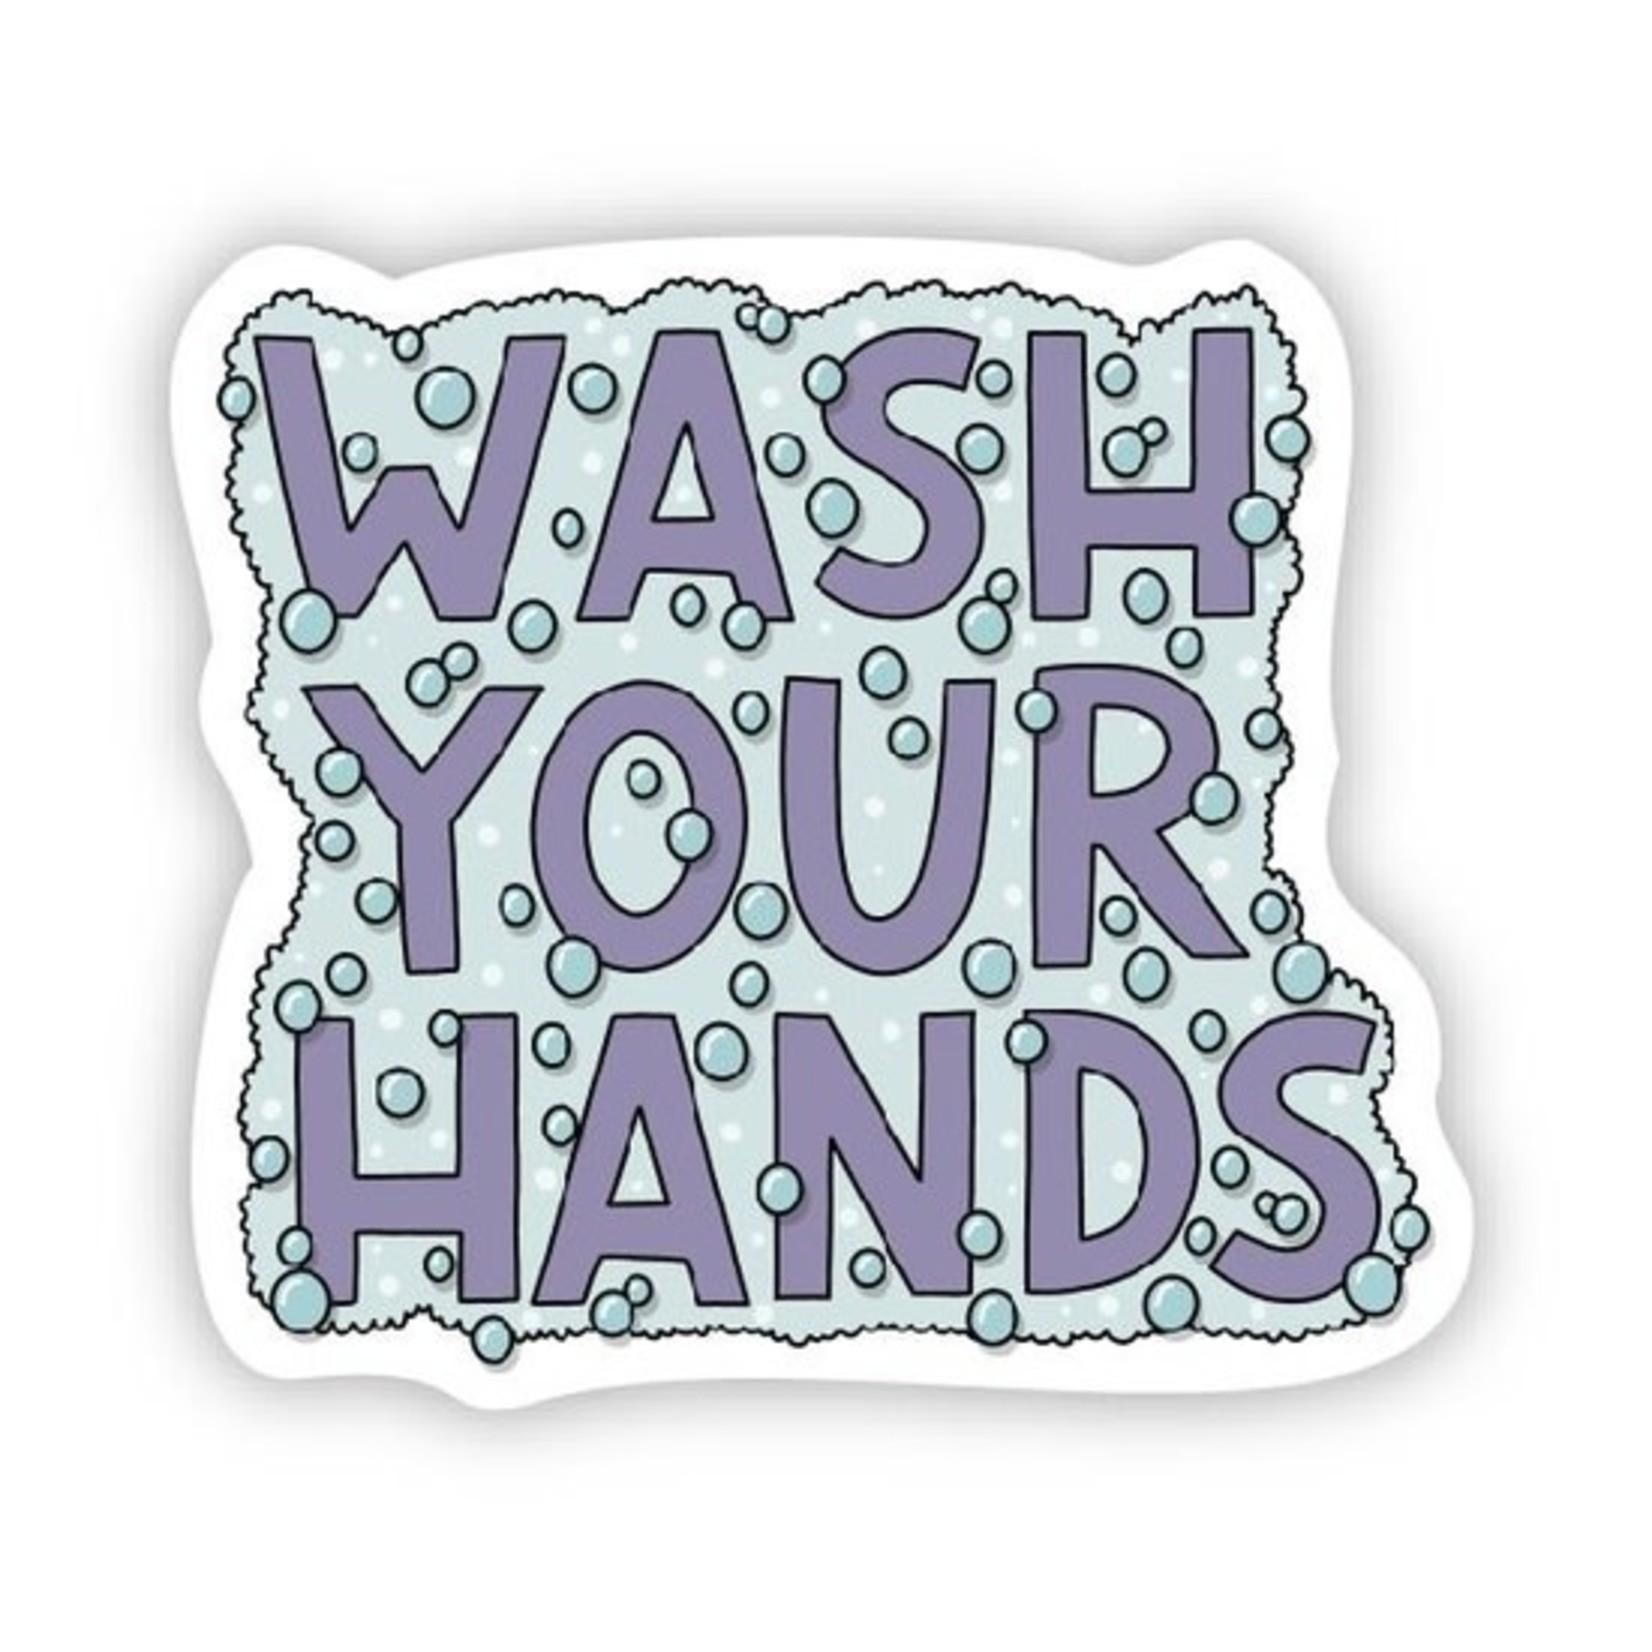 Big Moods Wash your hands sticker